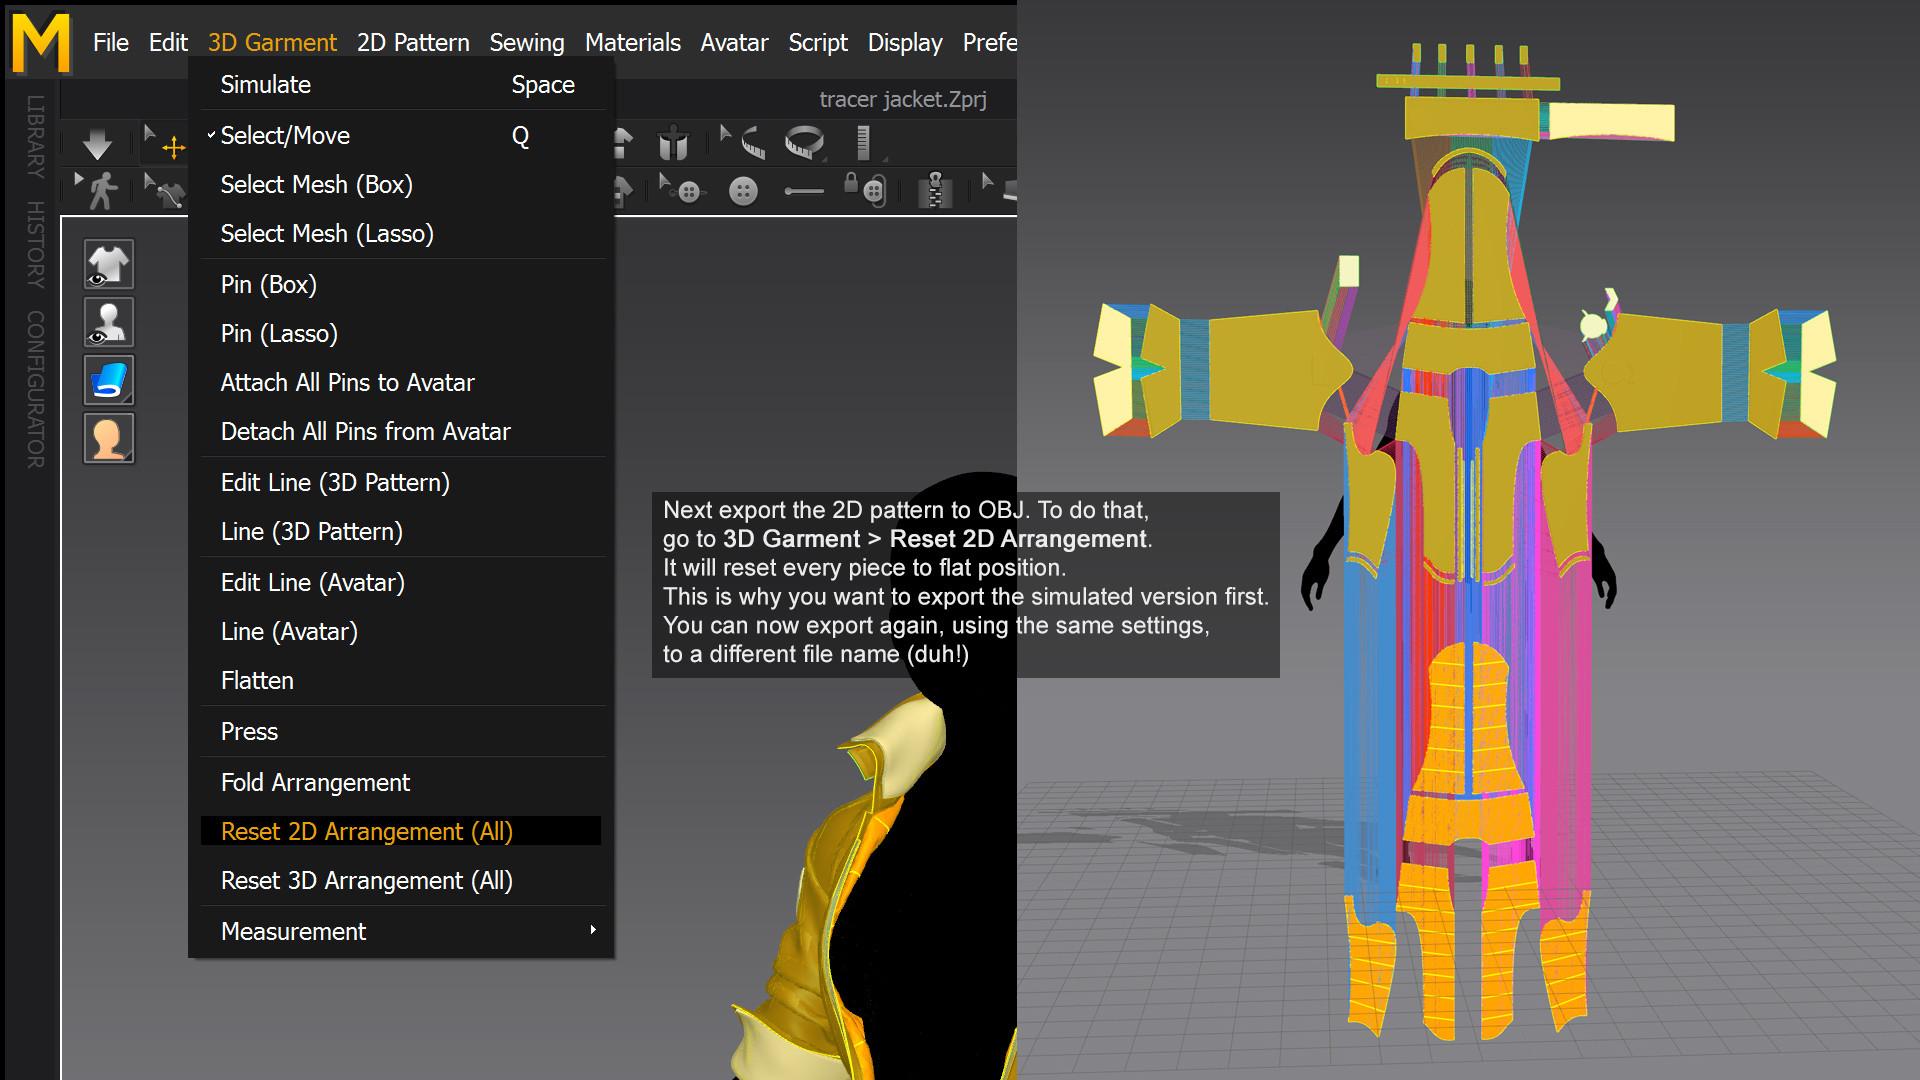 ArtStation - How to export from Marvelous Designer (like a